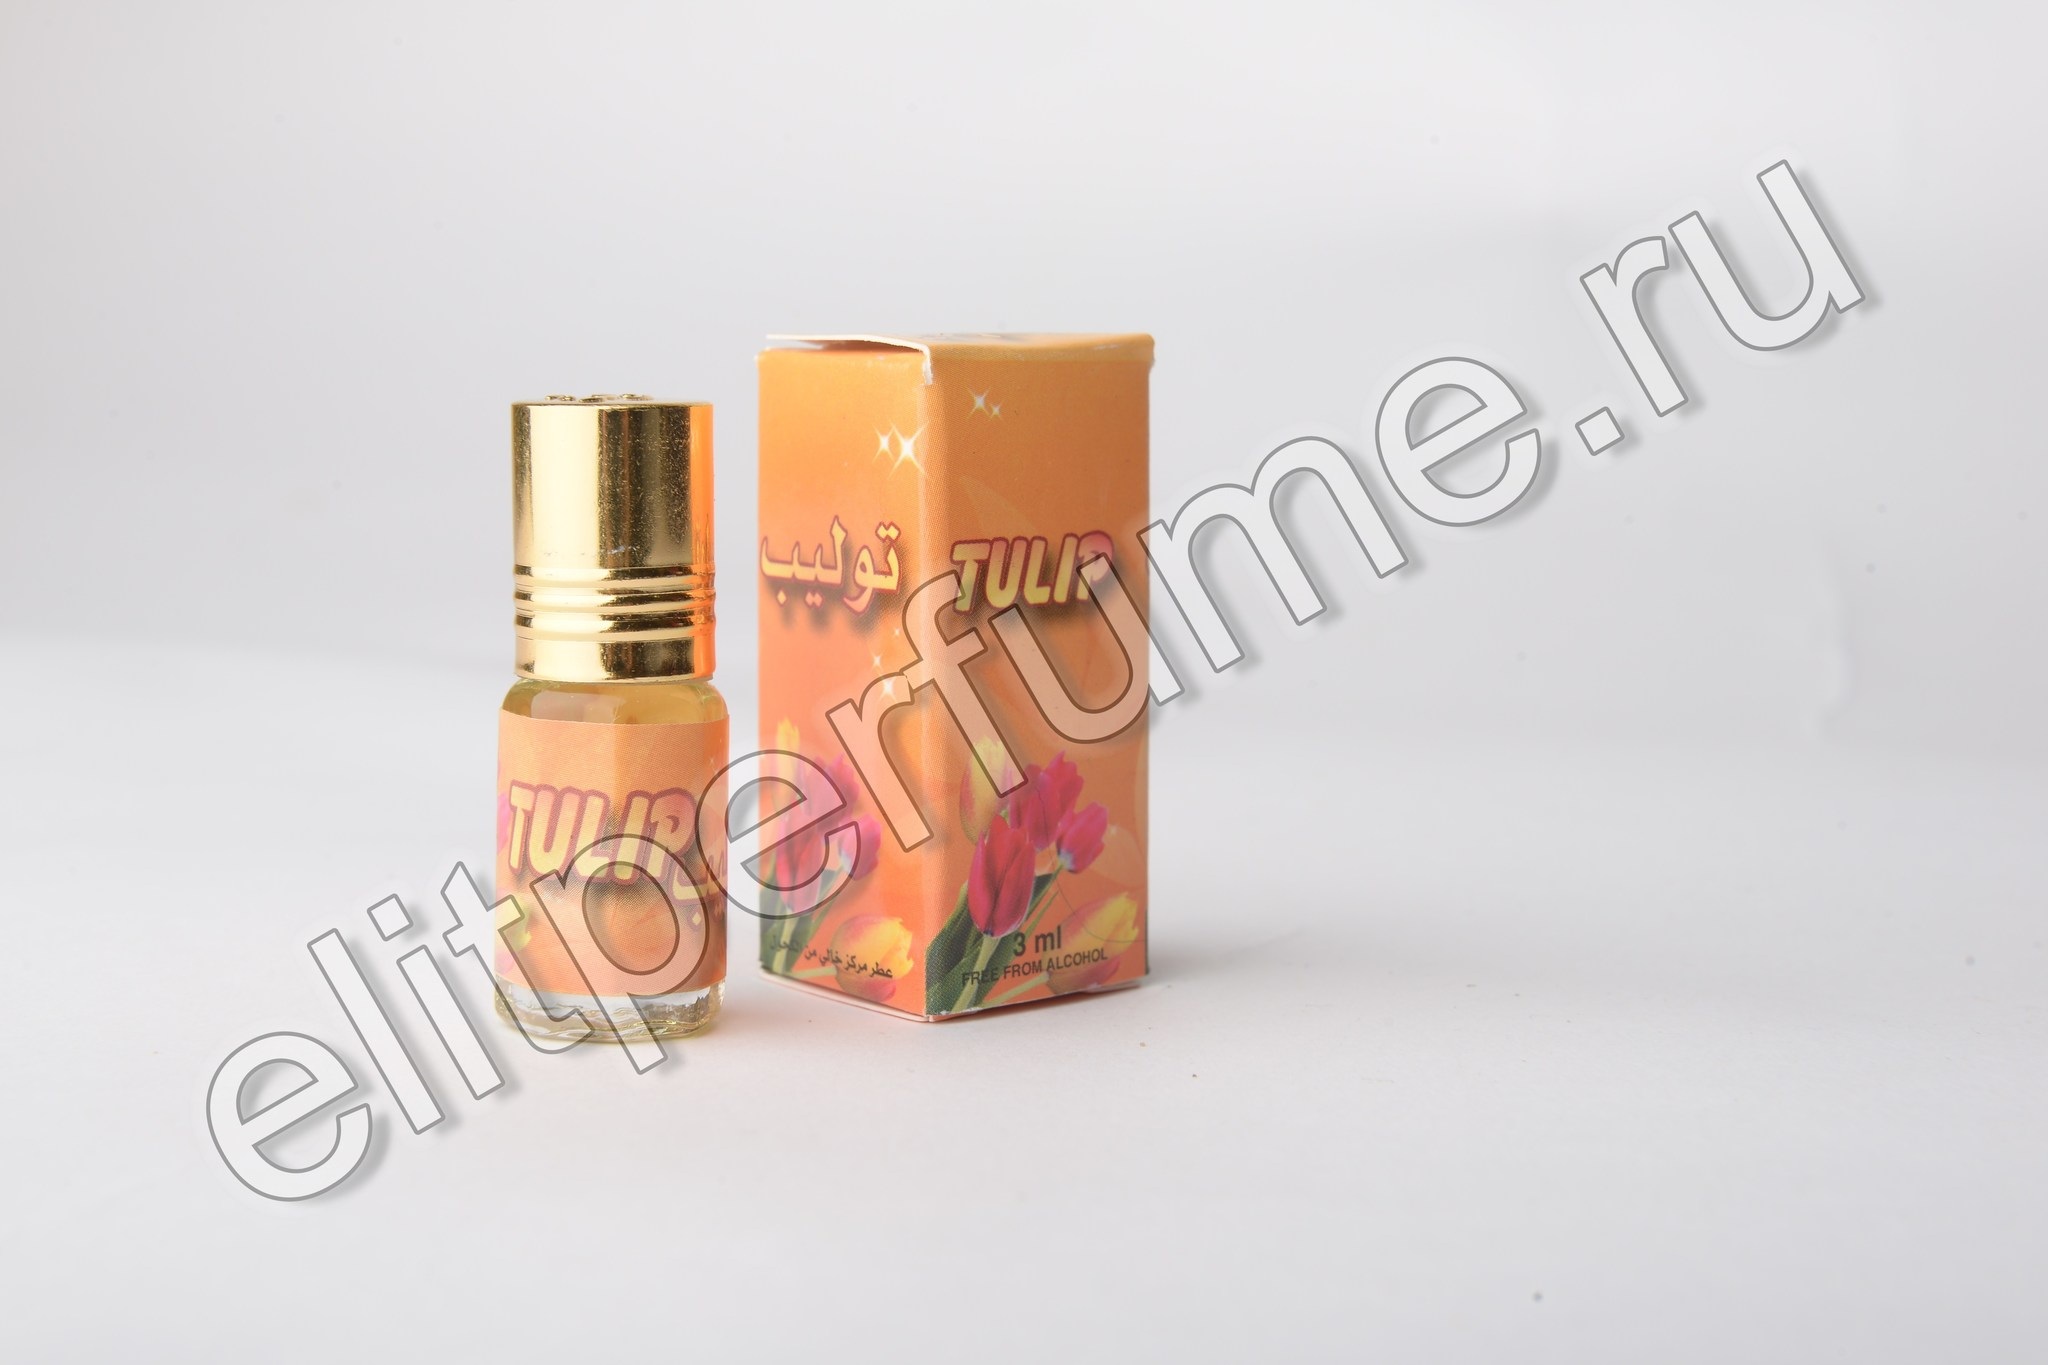 Tulip 3 мл арабские масляные духи от Захра Zahra Perfumes